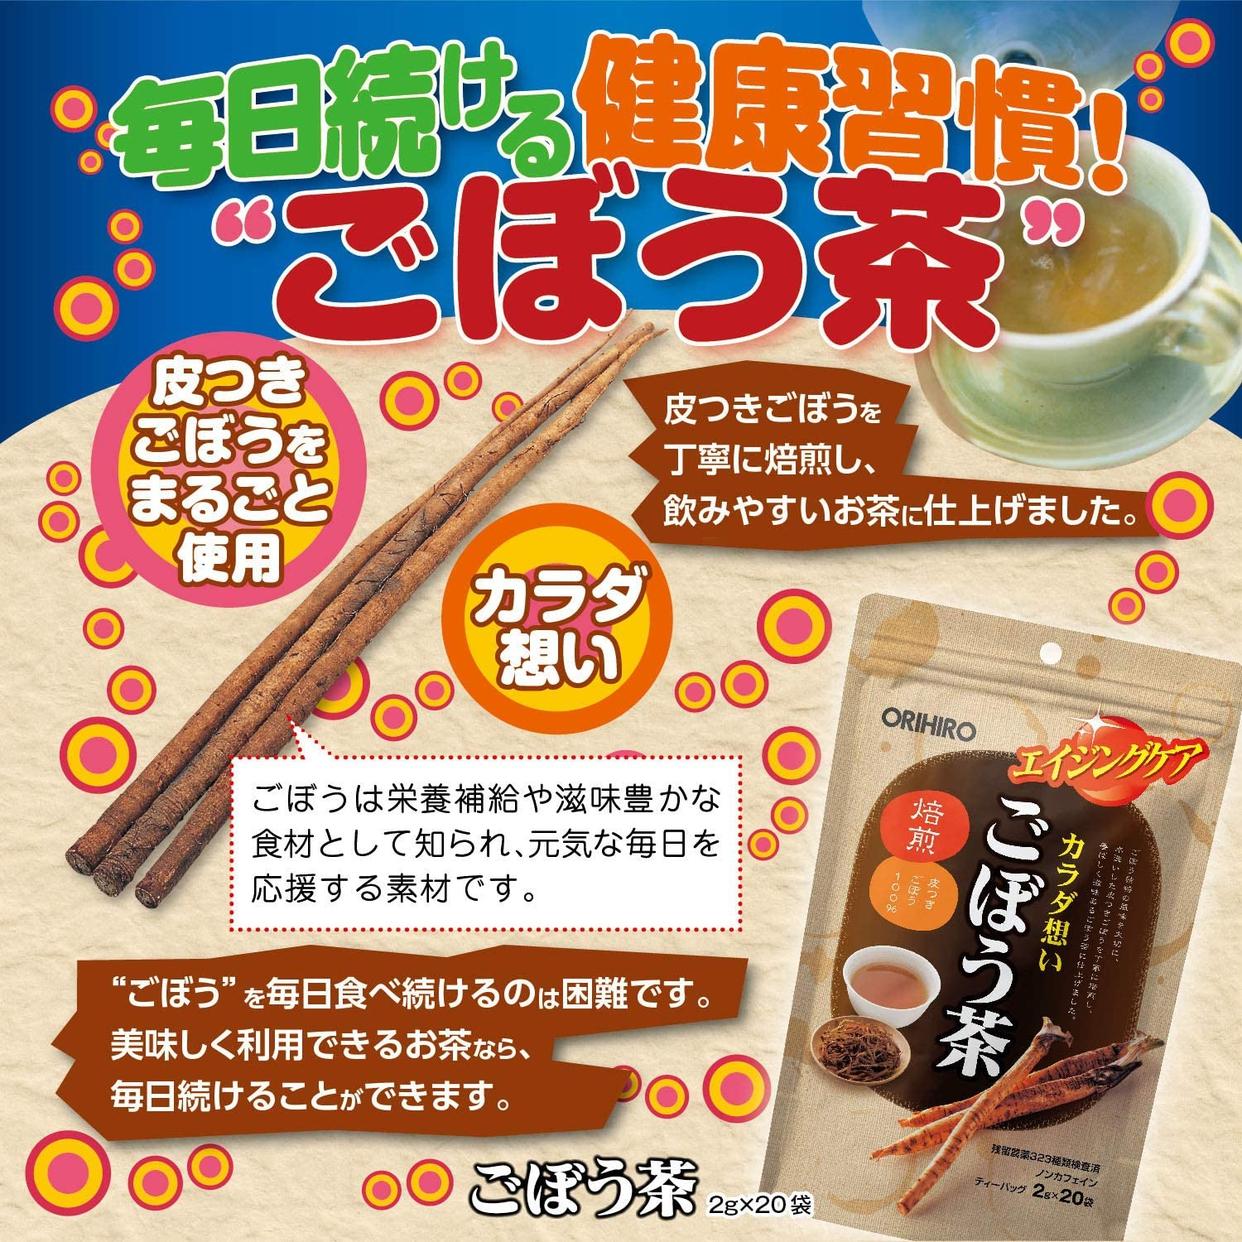 ORIHIRO(オリヒロ) ごぼう茶の商品画像4